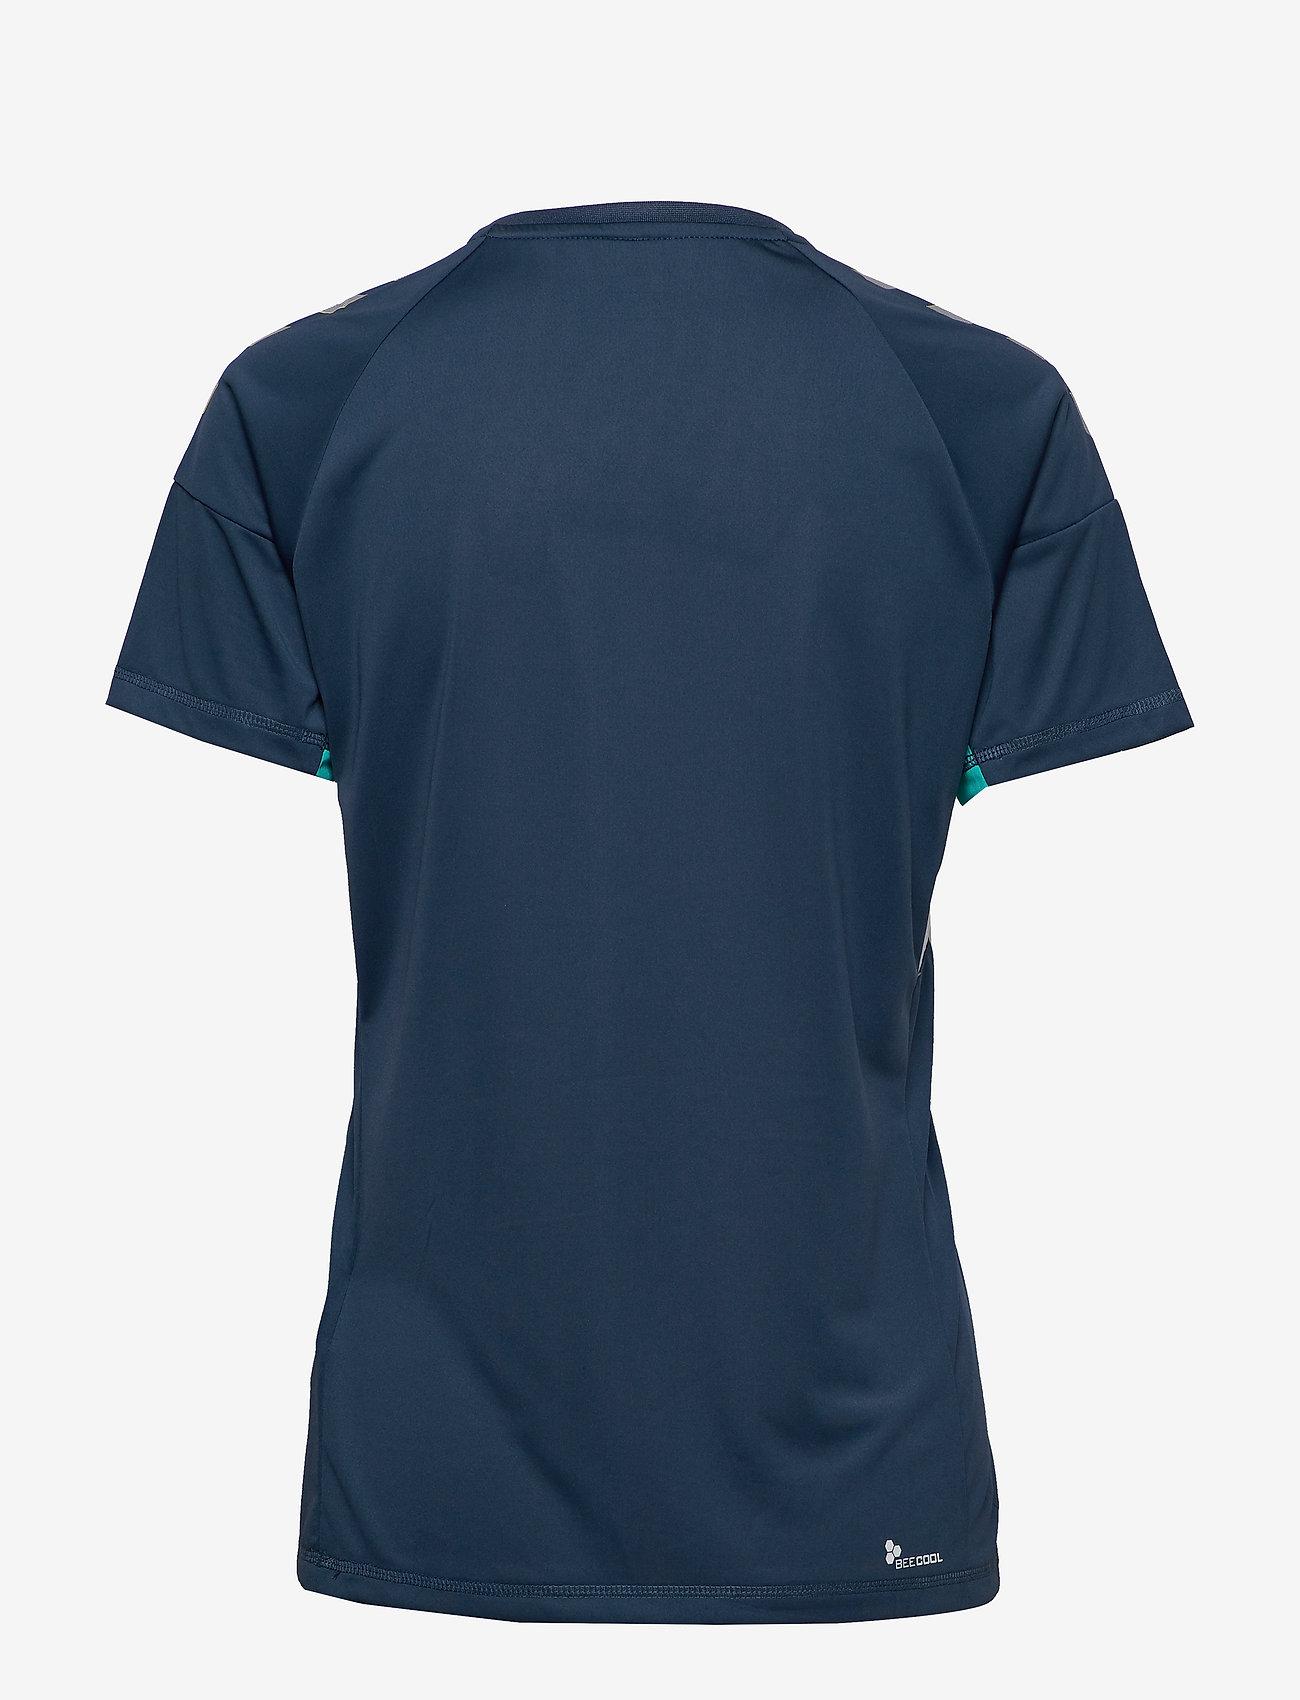 Hummel - TECH MOVE JERSEY WOMAN S/S - football shirts - sargasso sea - 1